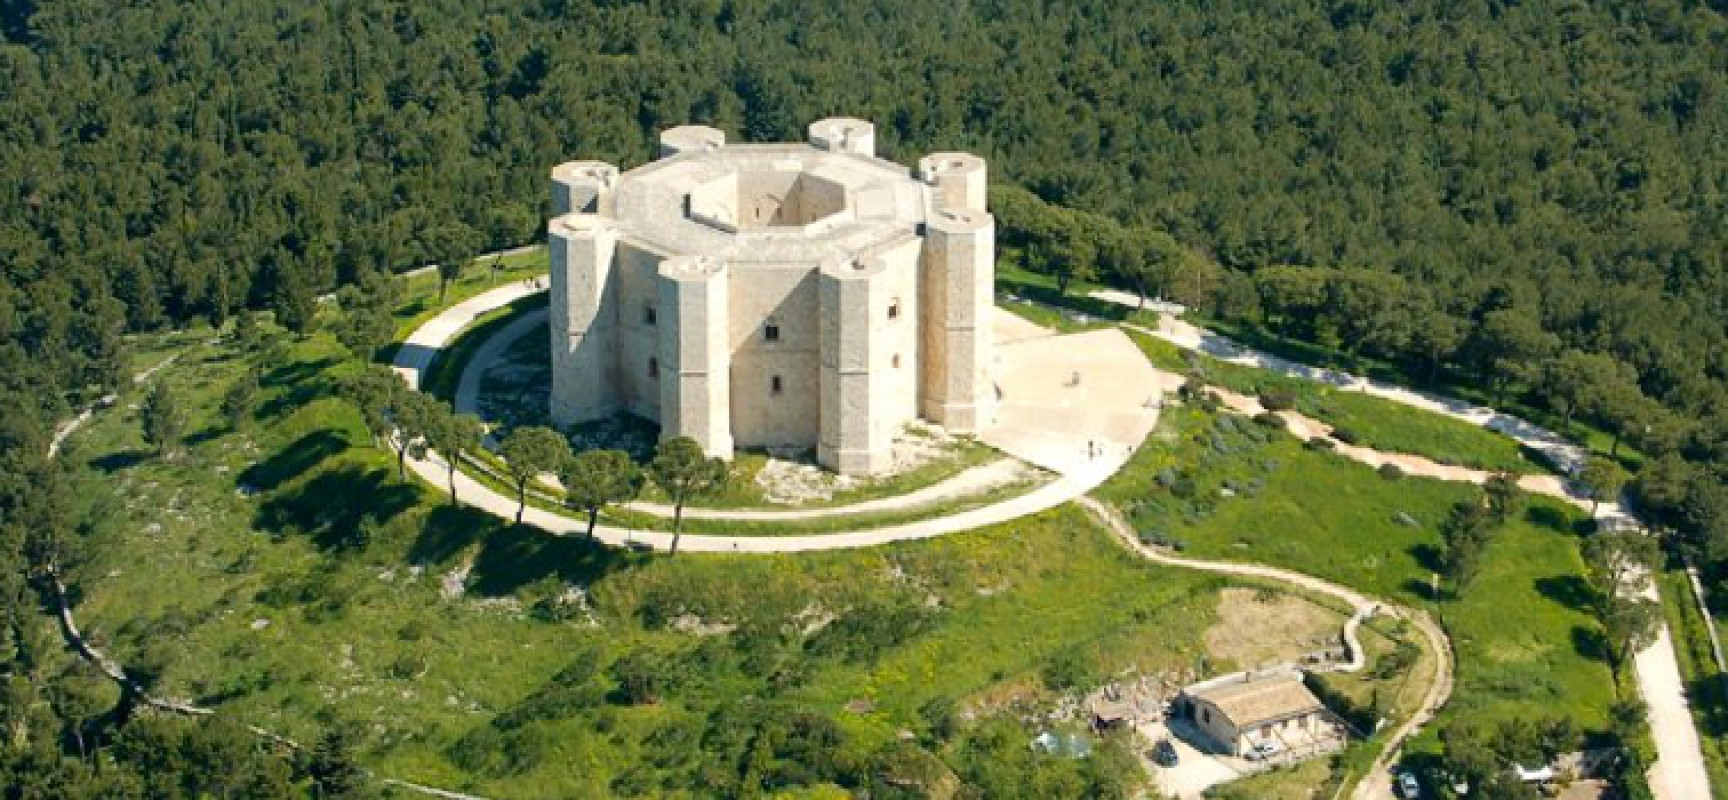 castel del monte - photo #31